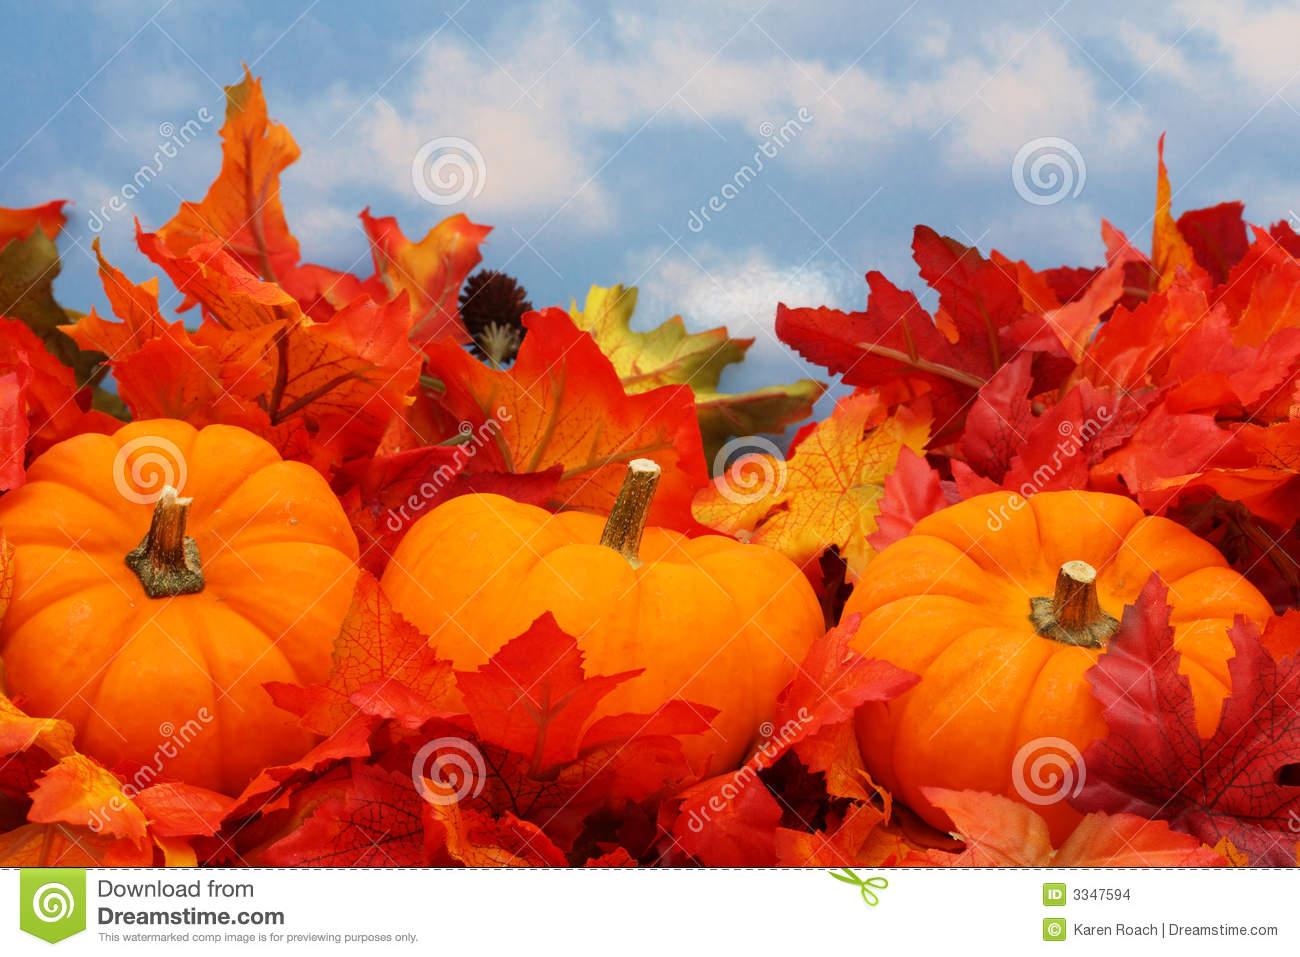 49 fall scene wallpaper with pumpkins on wallpapersafari - Pics of fall scenes ...